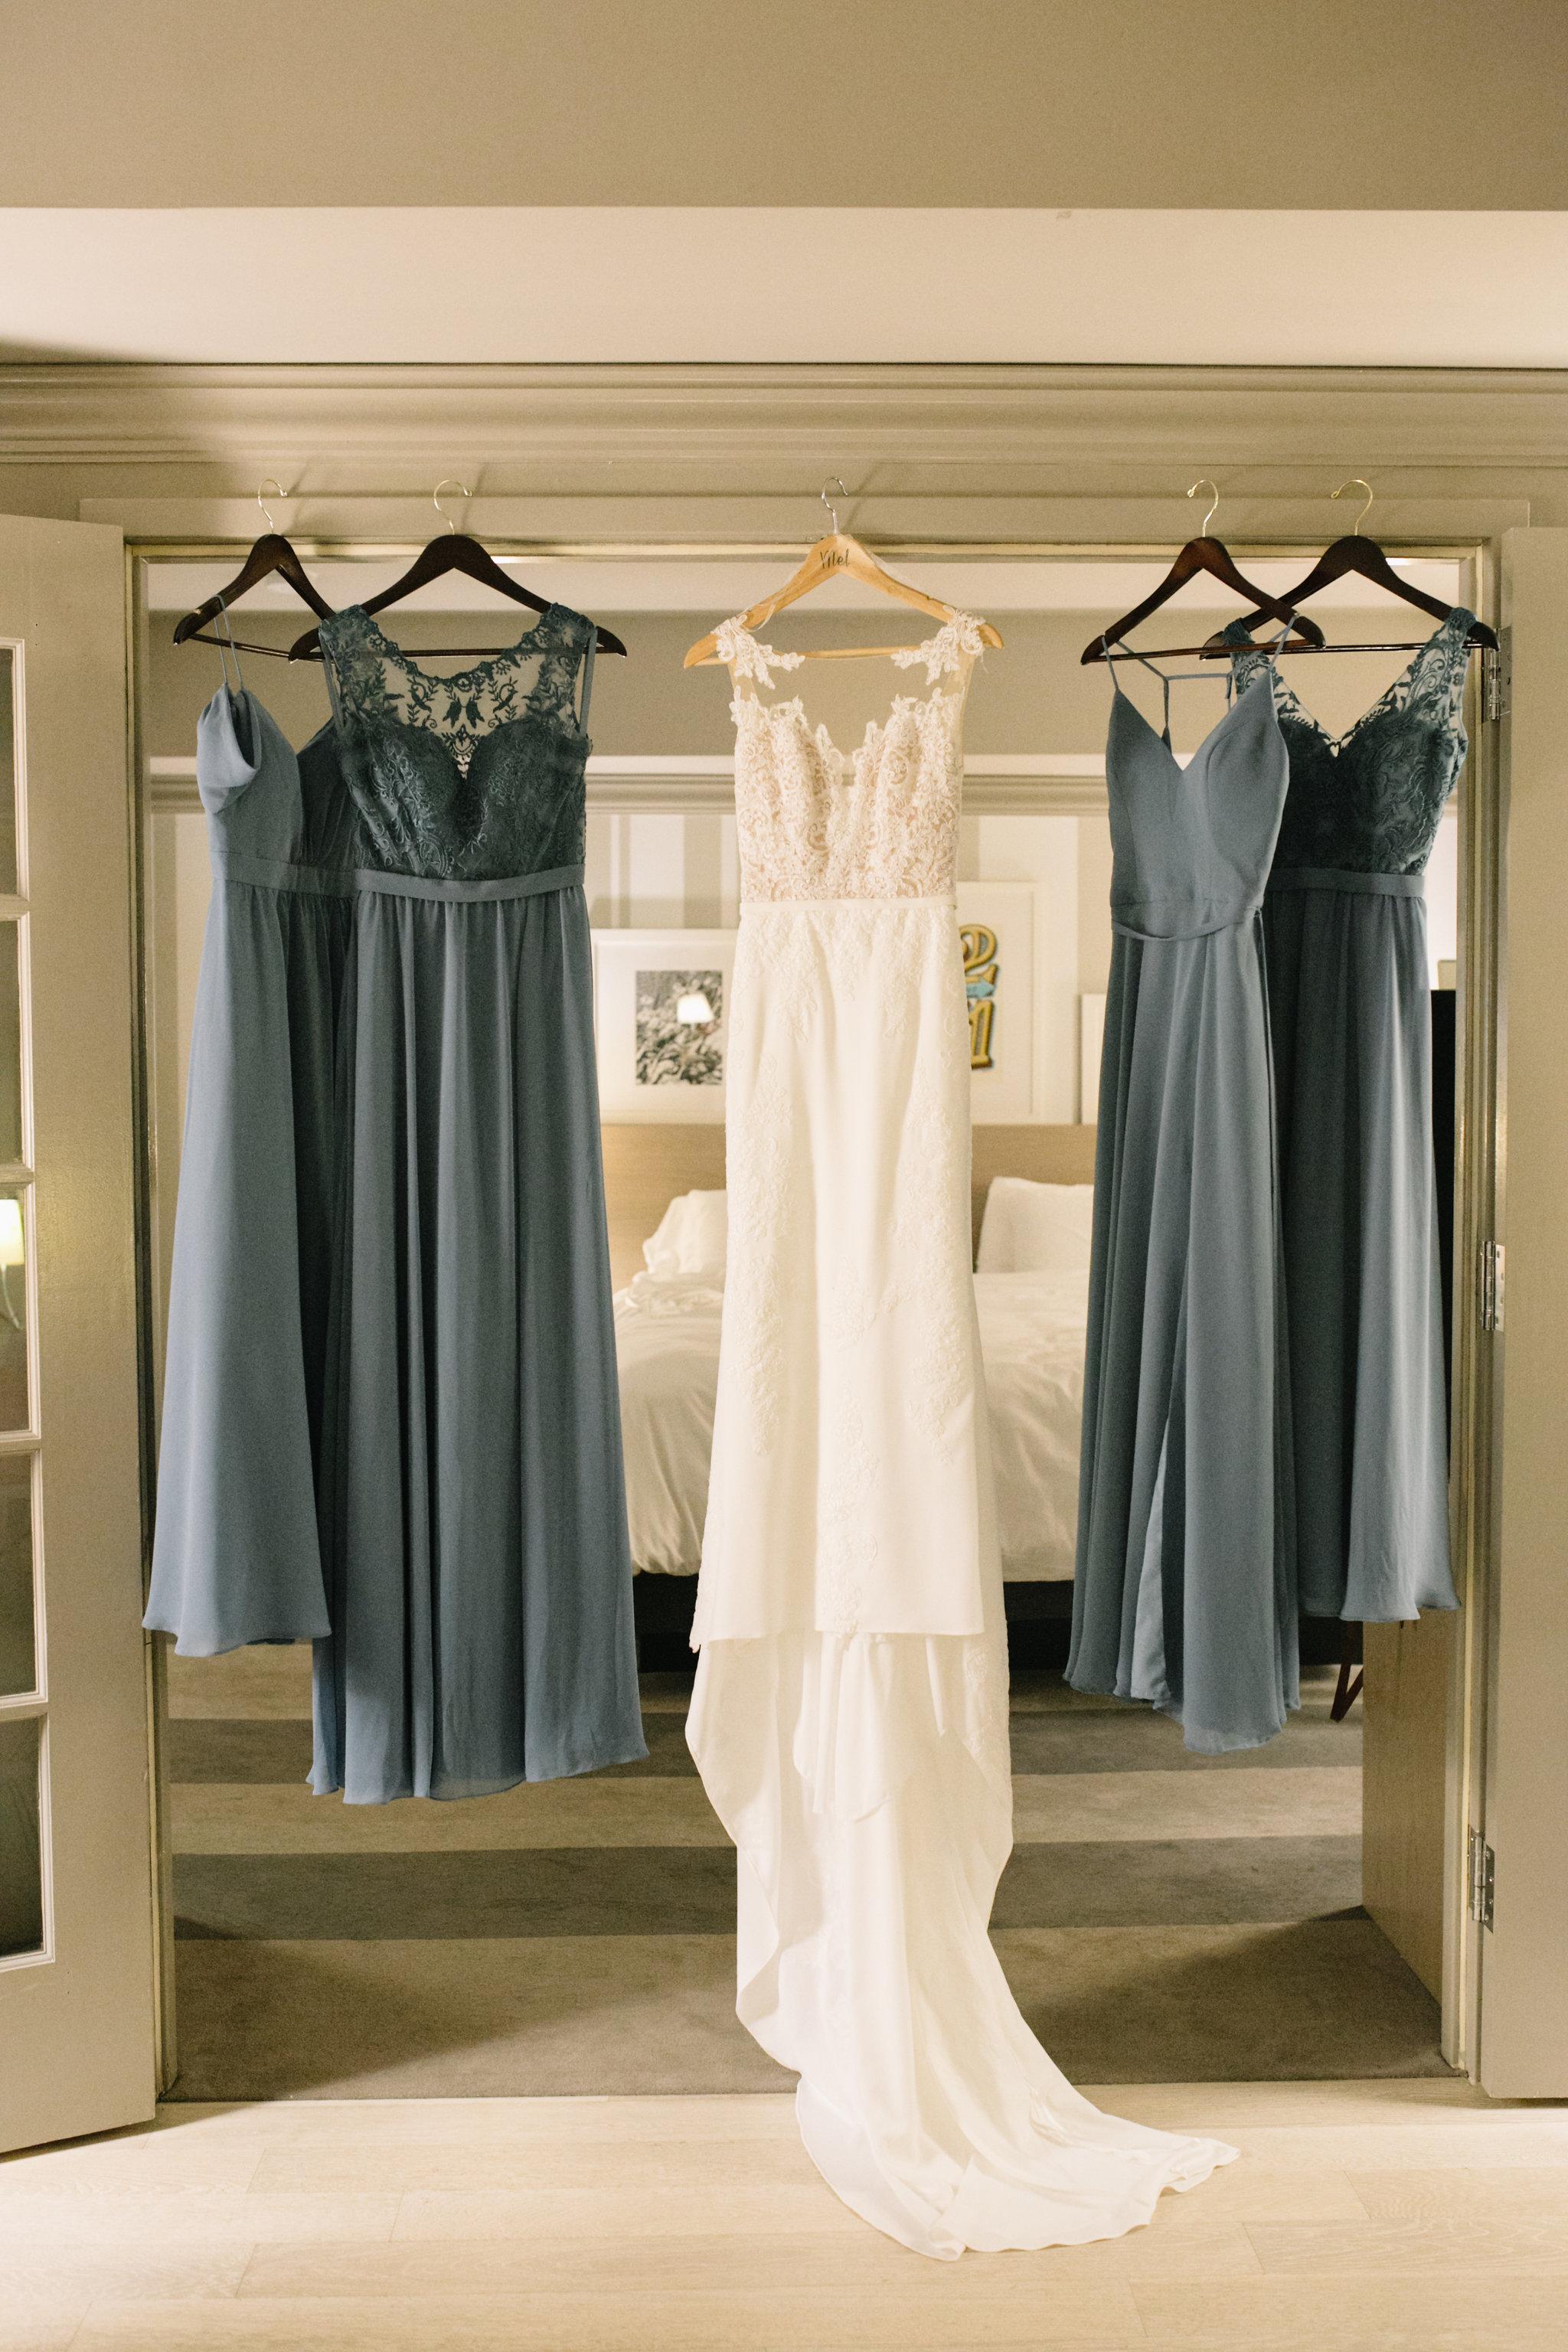 dresses hanging up::  Whims and Joy Minneapolis photographer :: Sixpence Events & Planning Minnesota wedding planner :: Nicollet Island Pavilion.jpg